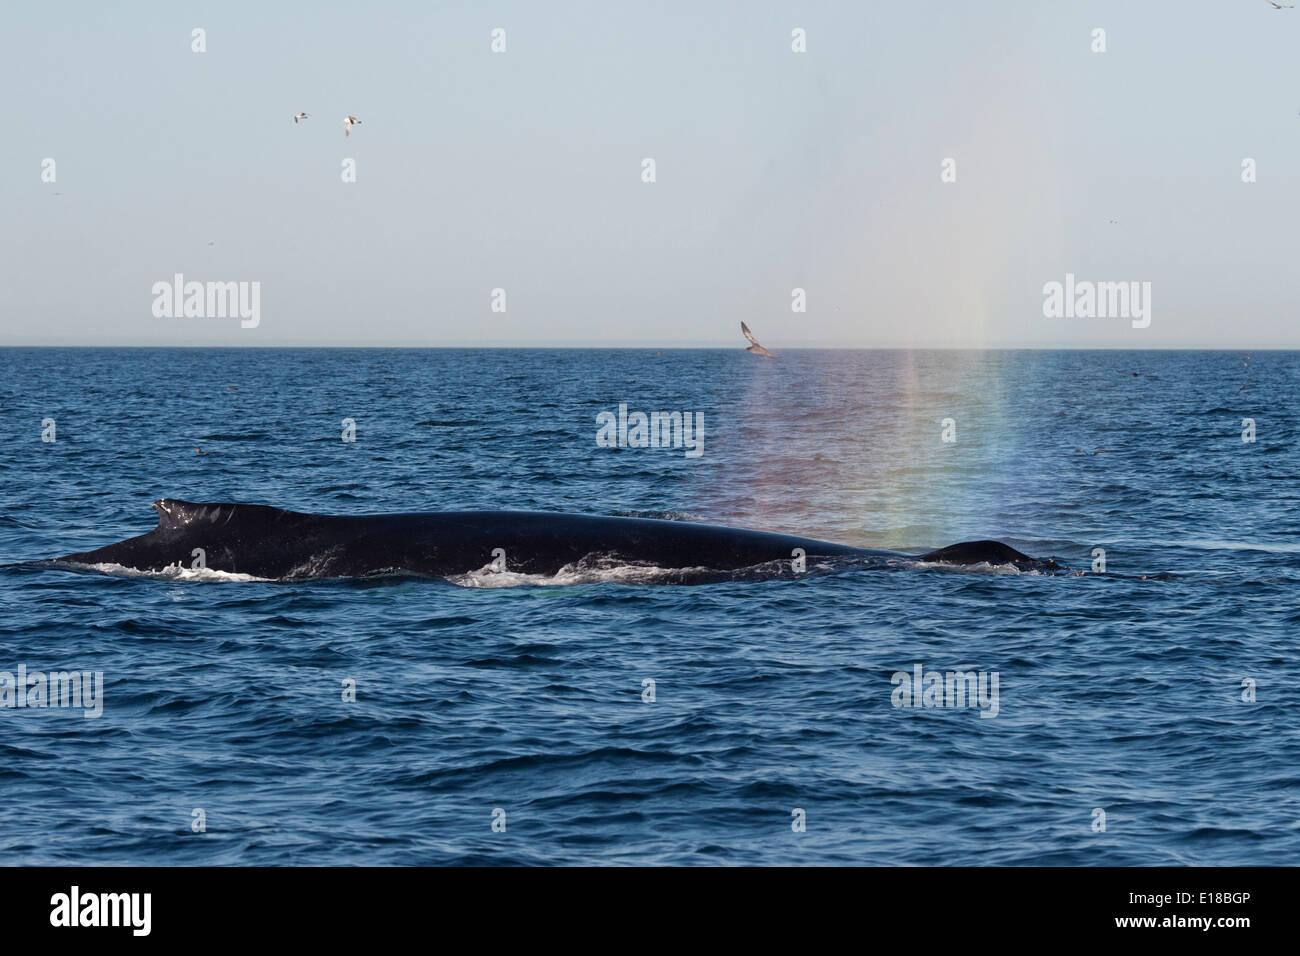 Humpback Whale (Megaptera novaeangliae) rain-blow. Monterey, California, Pacific Ocean. - Stock Image